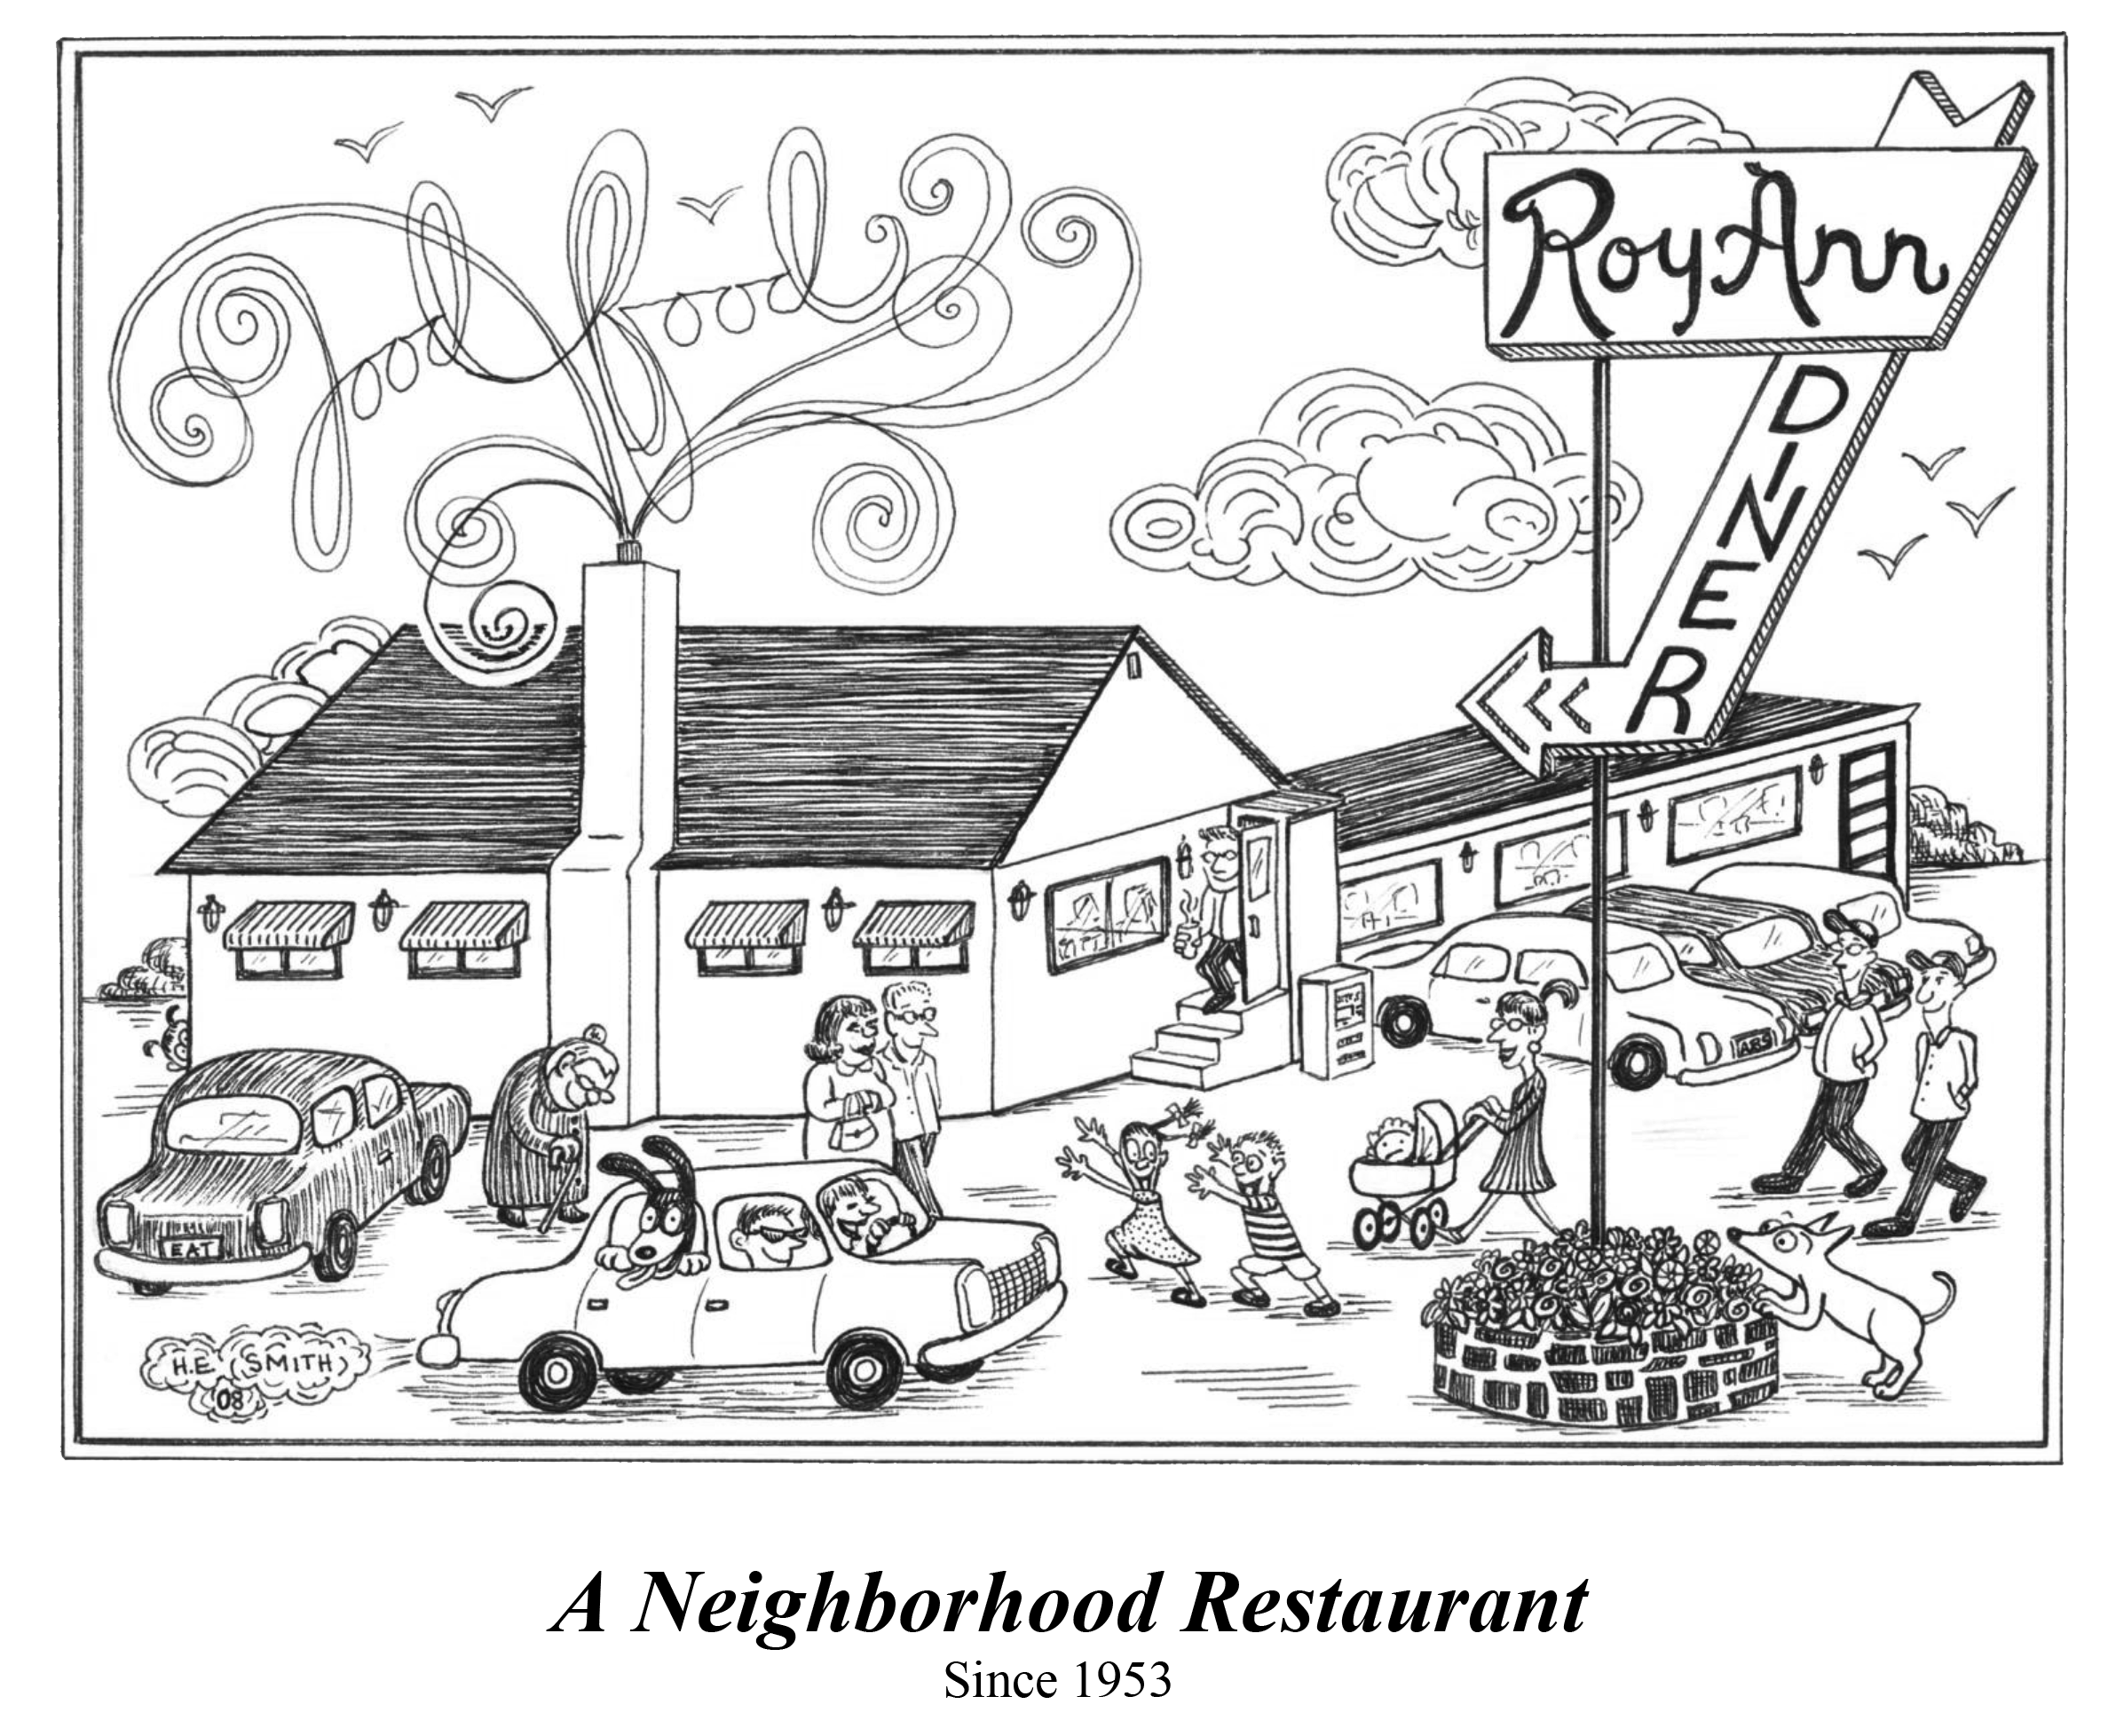 Roy Ann Diner Home